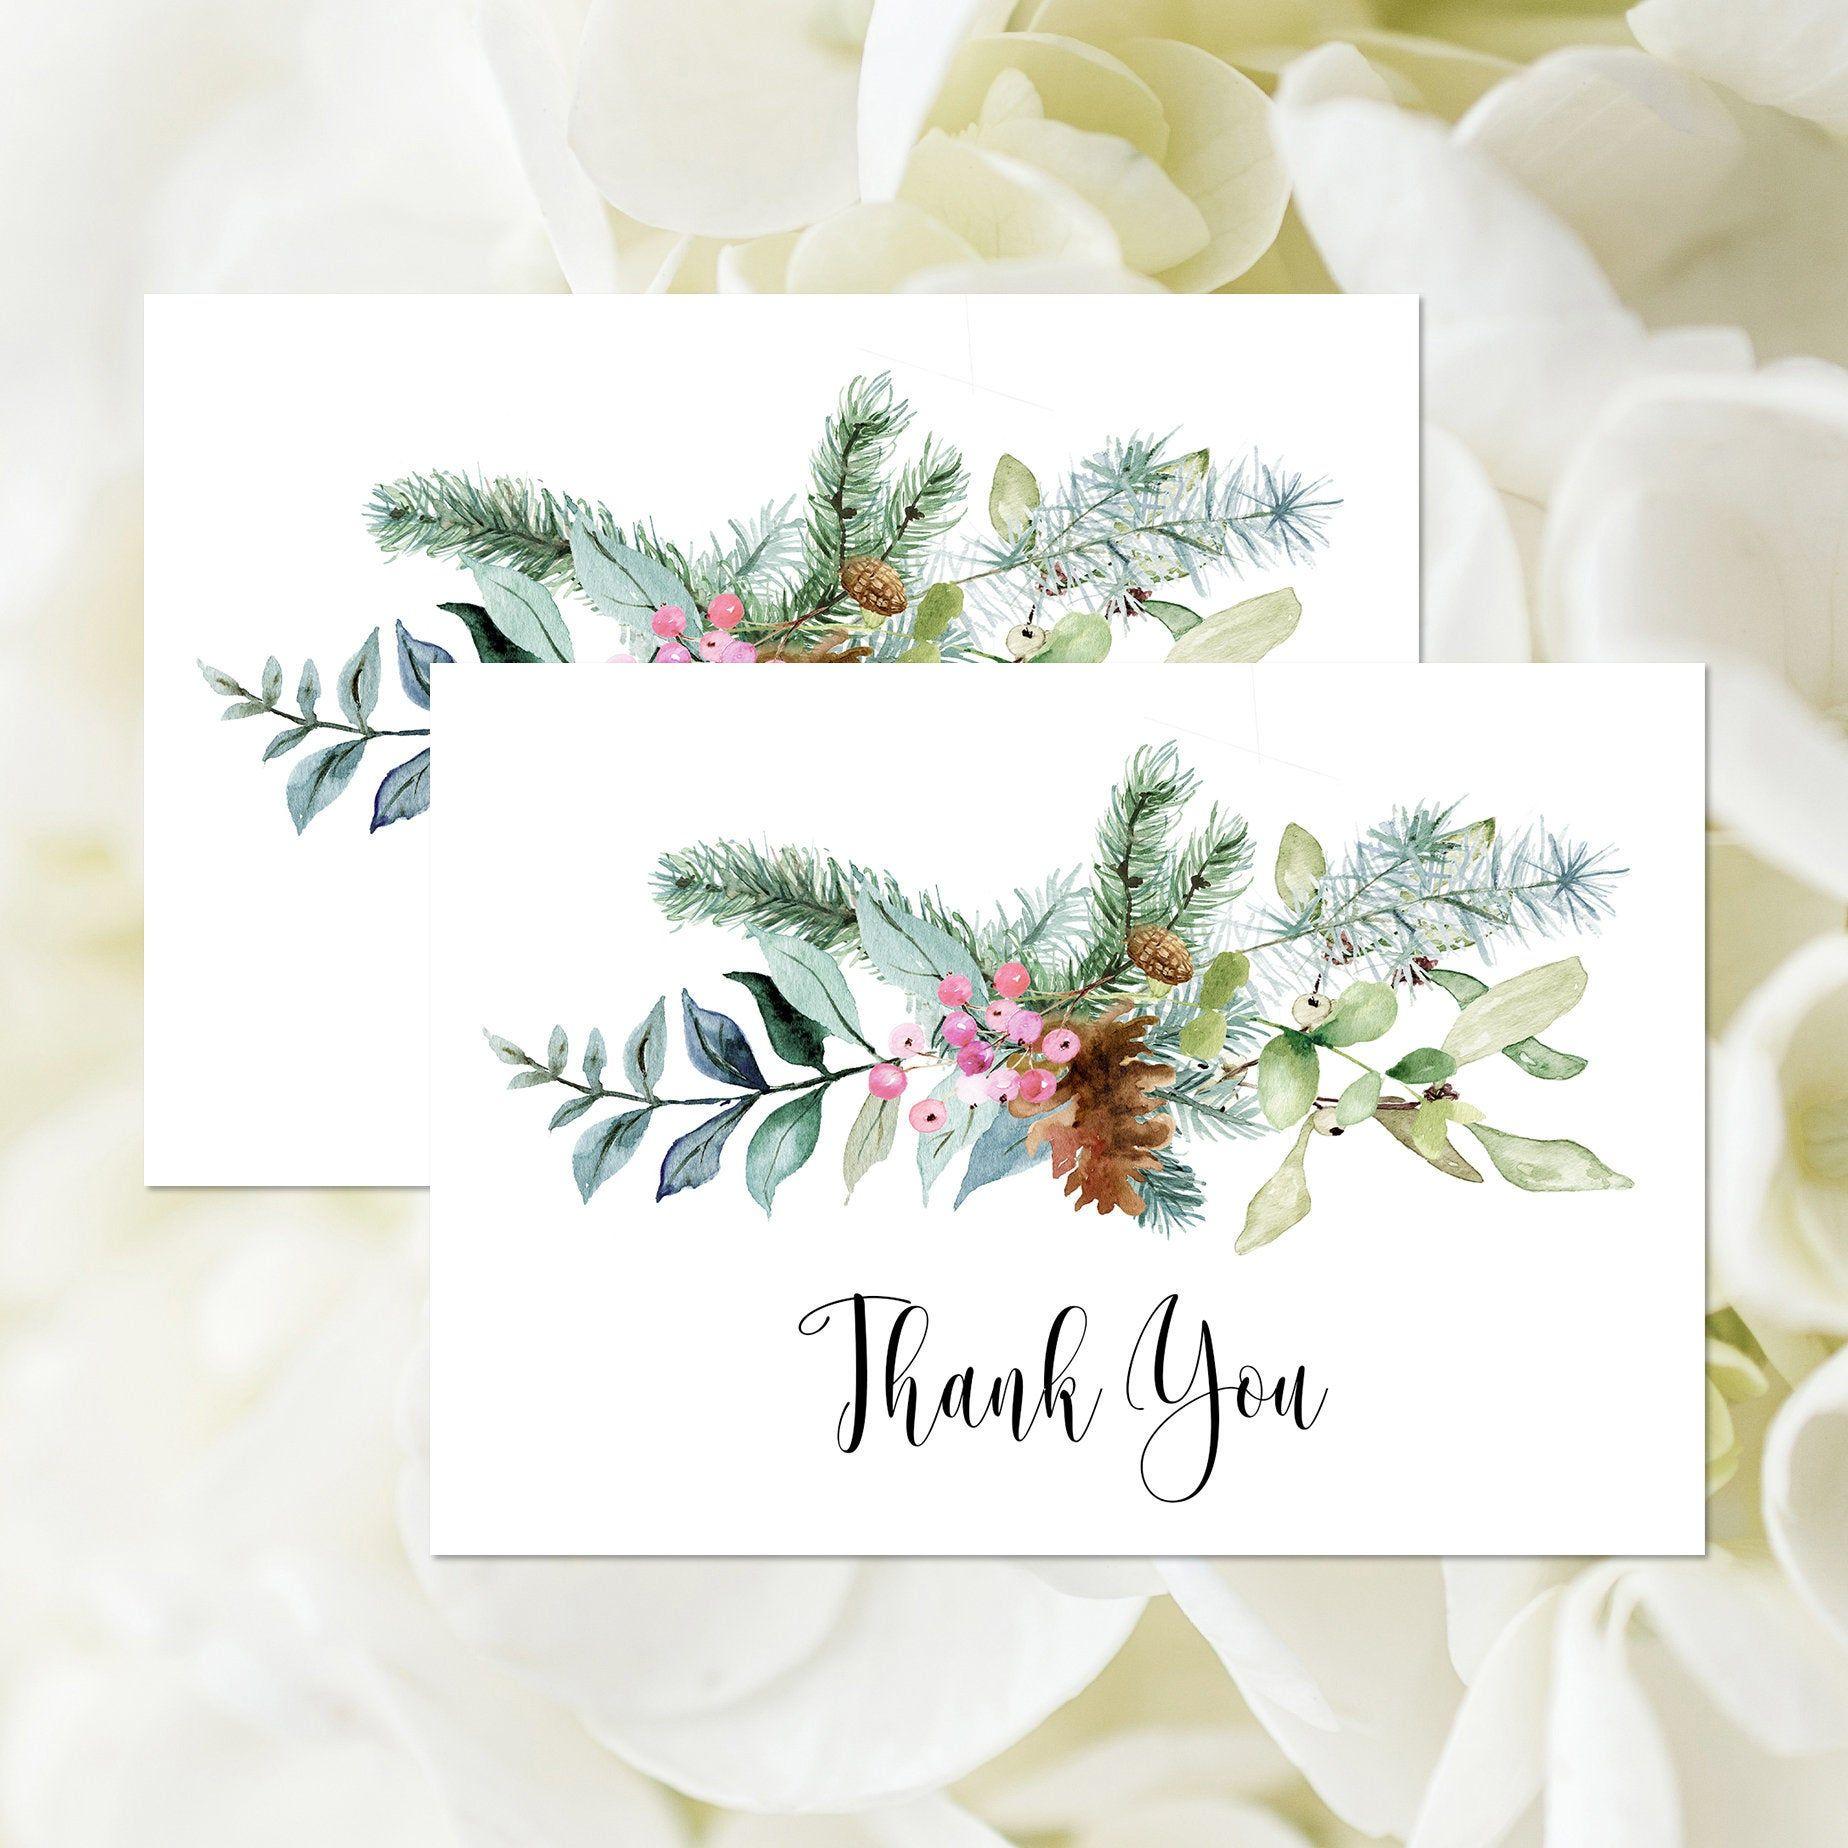 Rustic Winter Thank You Card, Editable Template, Christmas